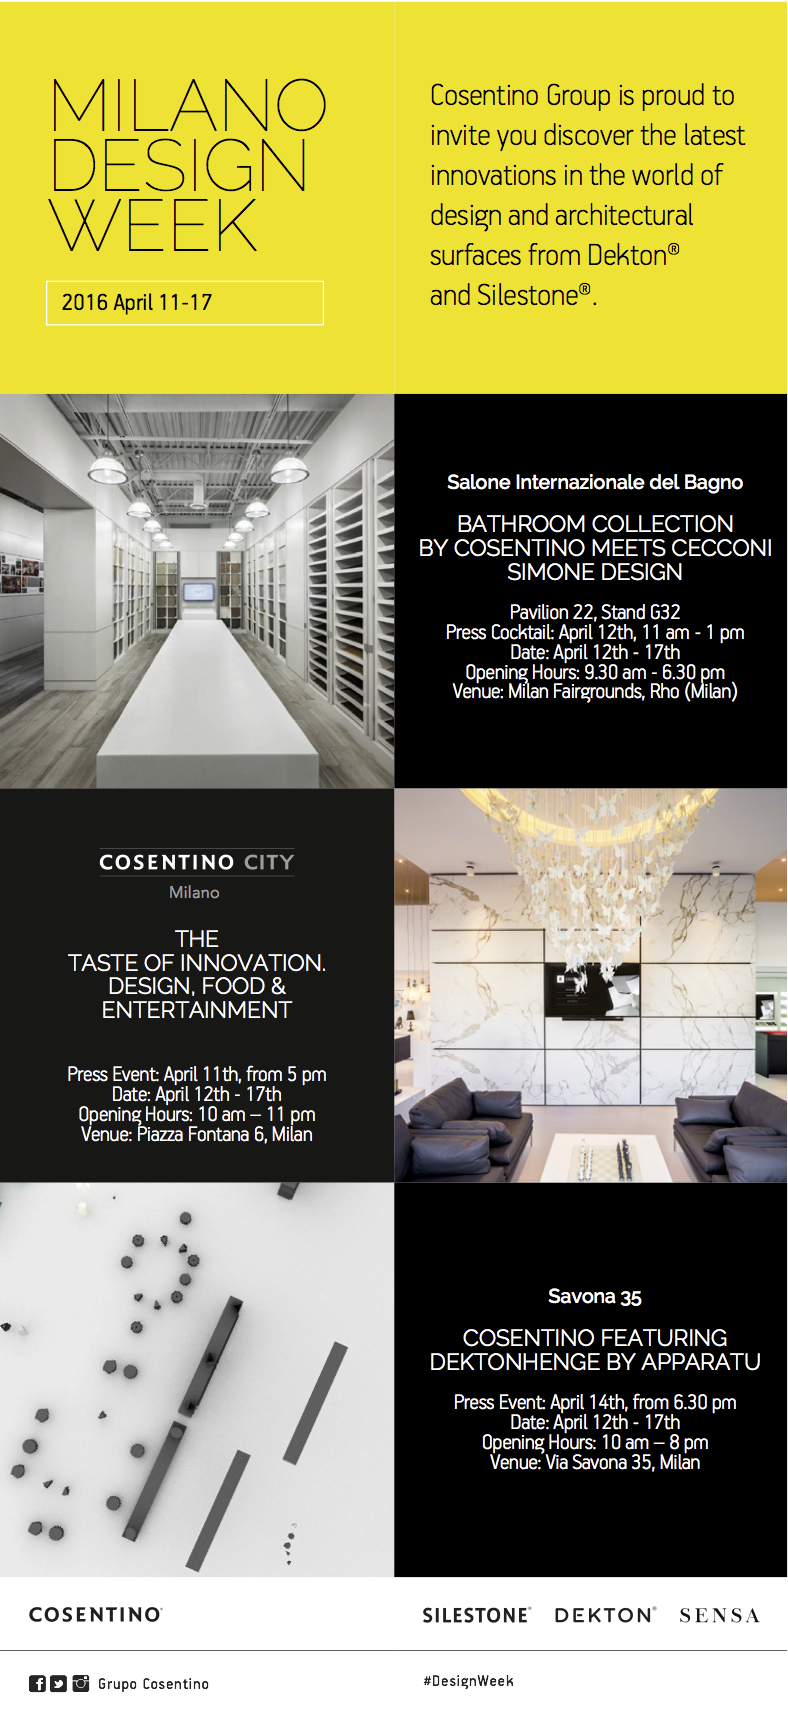 Einladung: Cosentino auf dem Salone del mobile.milano 2016